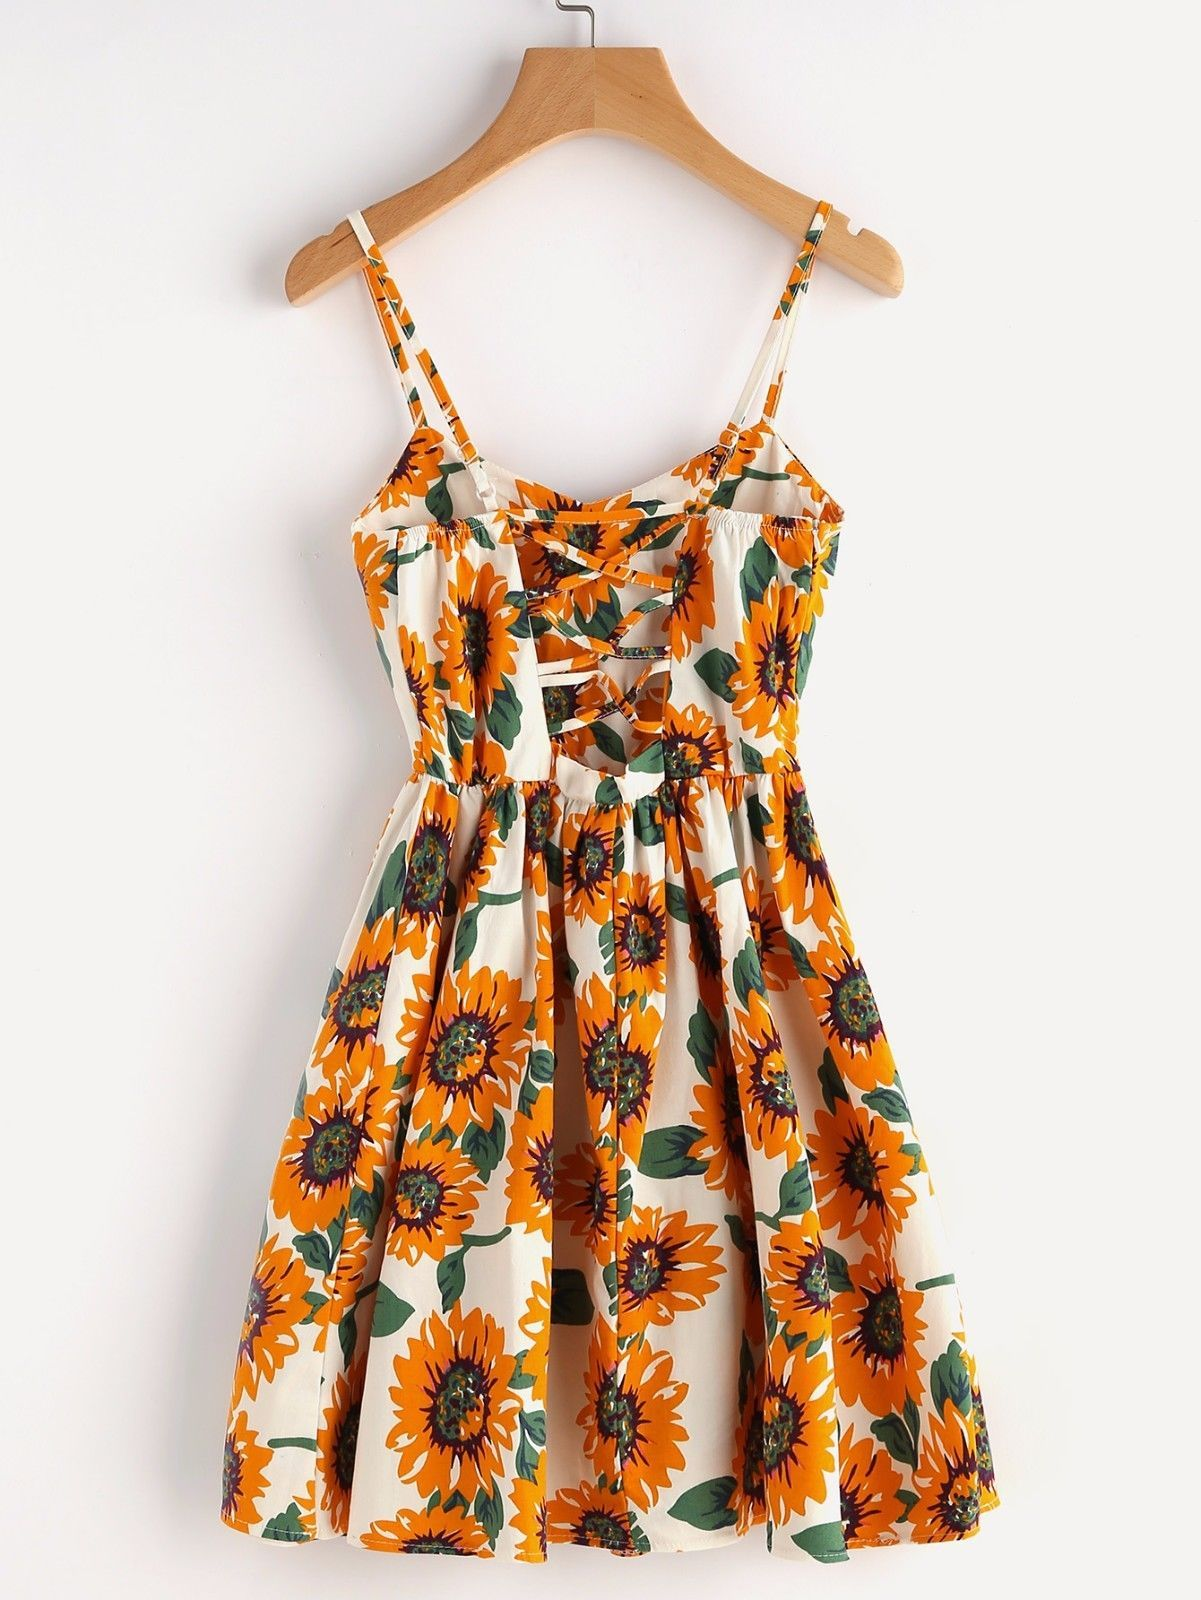 Cute Summer Sunflower Print Random Crisscross Back A Line Cami Casual Dress Mini Cami Dress Cami Dress Clothes [ 1600 x 1201 Pixel ]